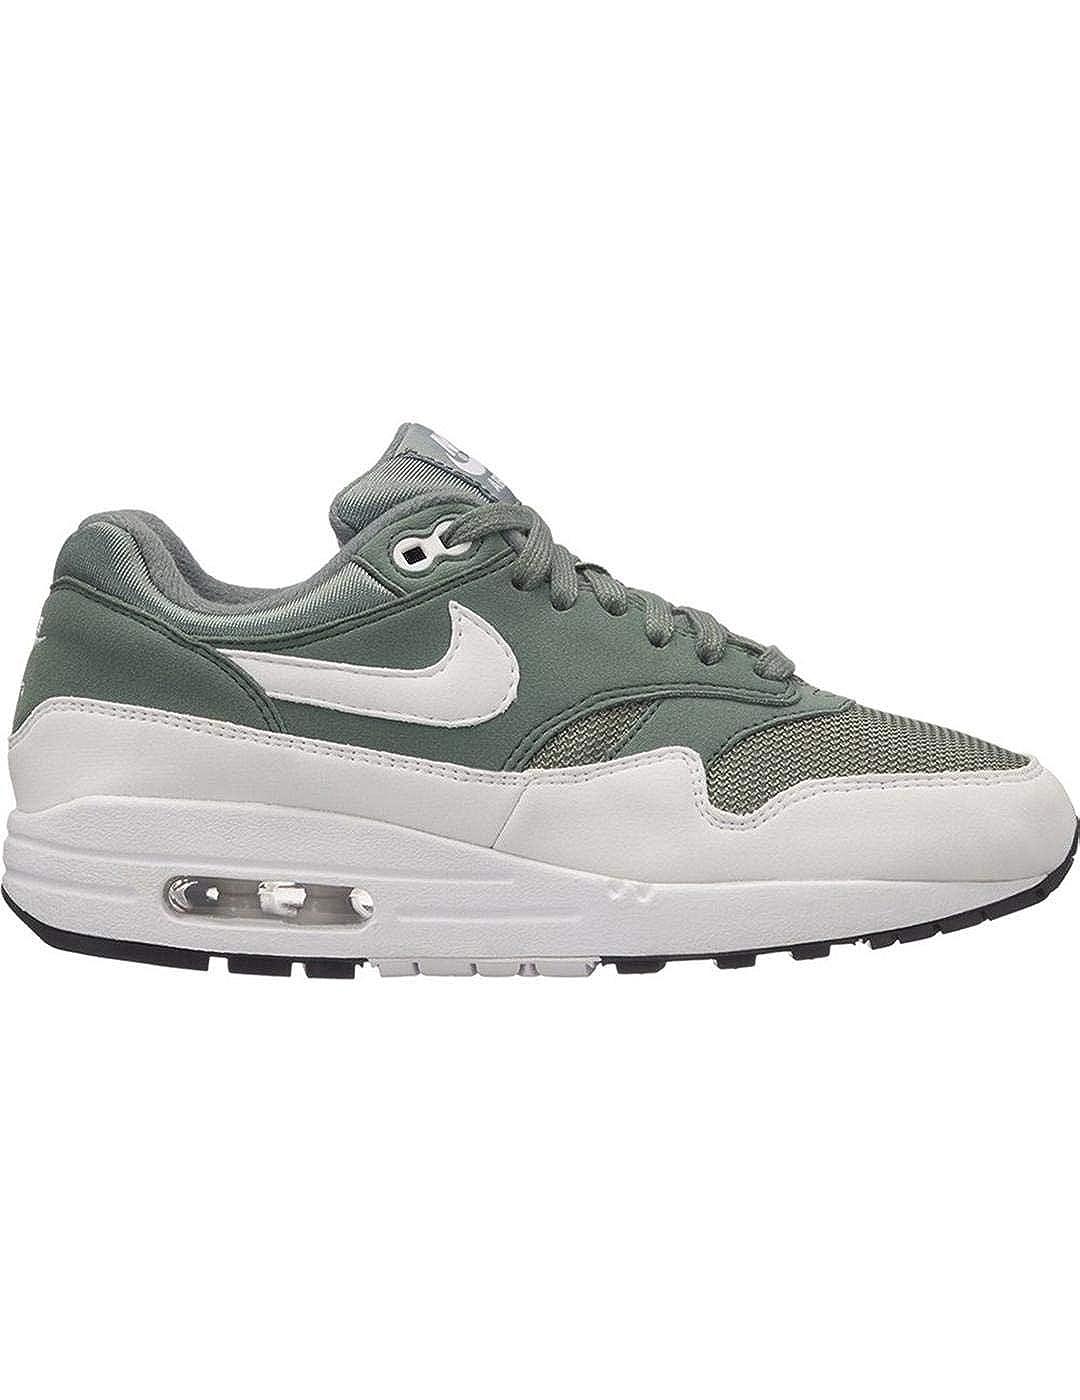 Nike Damen Turnschuhe Grün Clay Grün Weiß